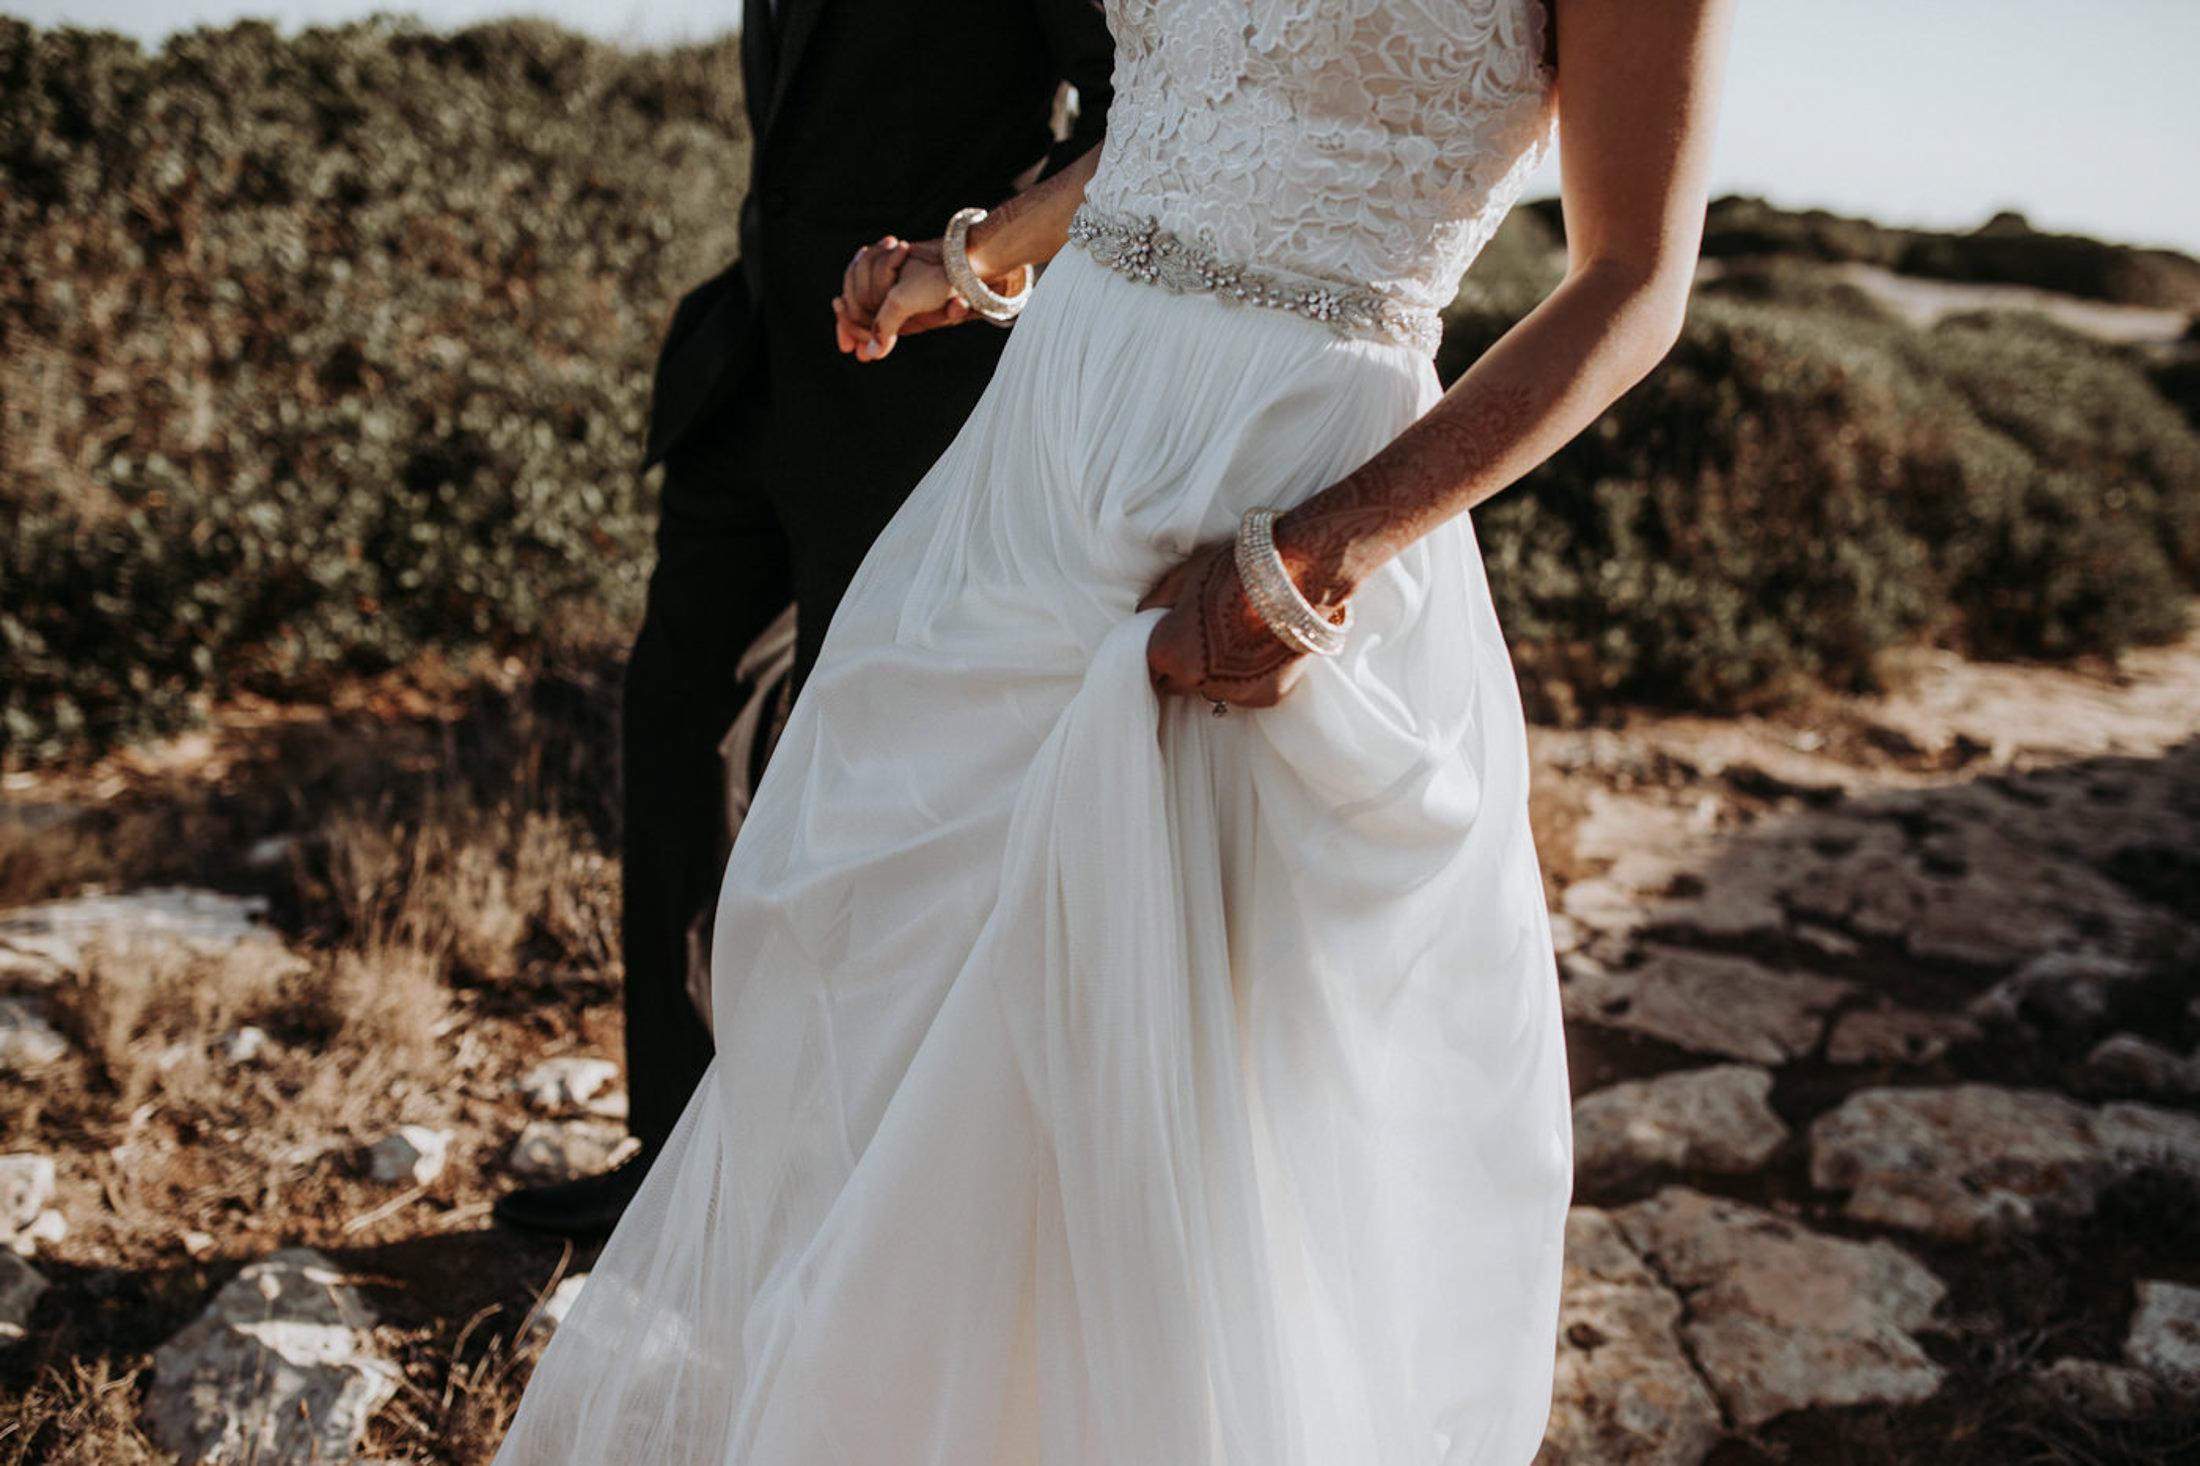 Wedding_Photographer_Mallorca_Daniela-Marquardt_Photography_New_York_Iceland_Tuscany_Santorini_Portugal_Austria_Bavaria_Elopement_Hochzeitsfotograf_AntjeRajat2_89